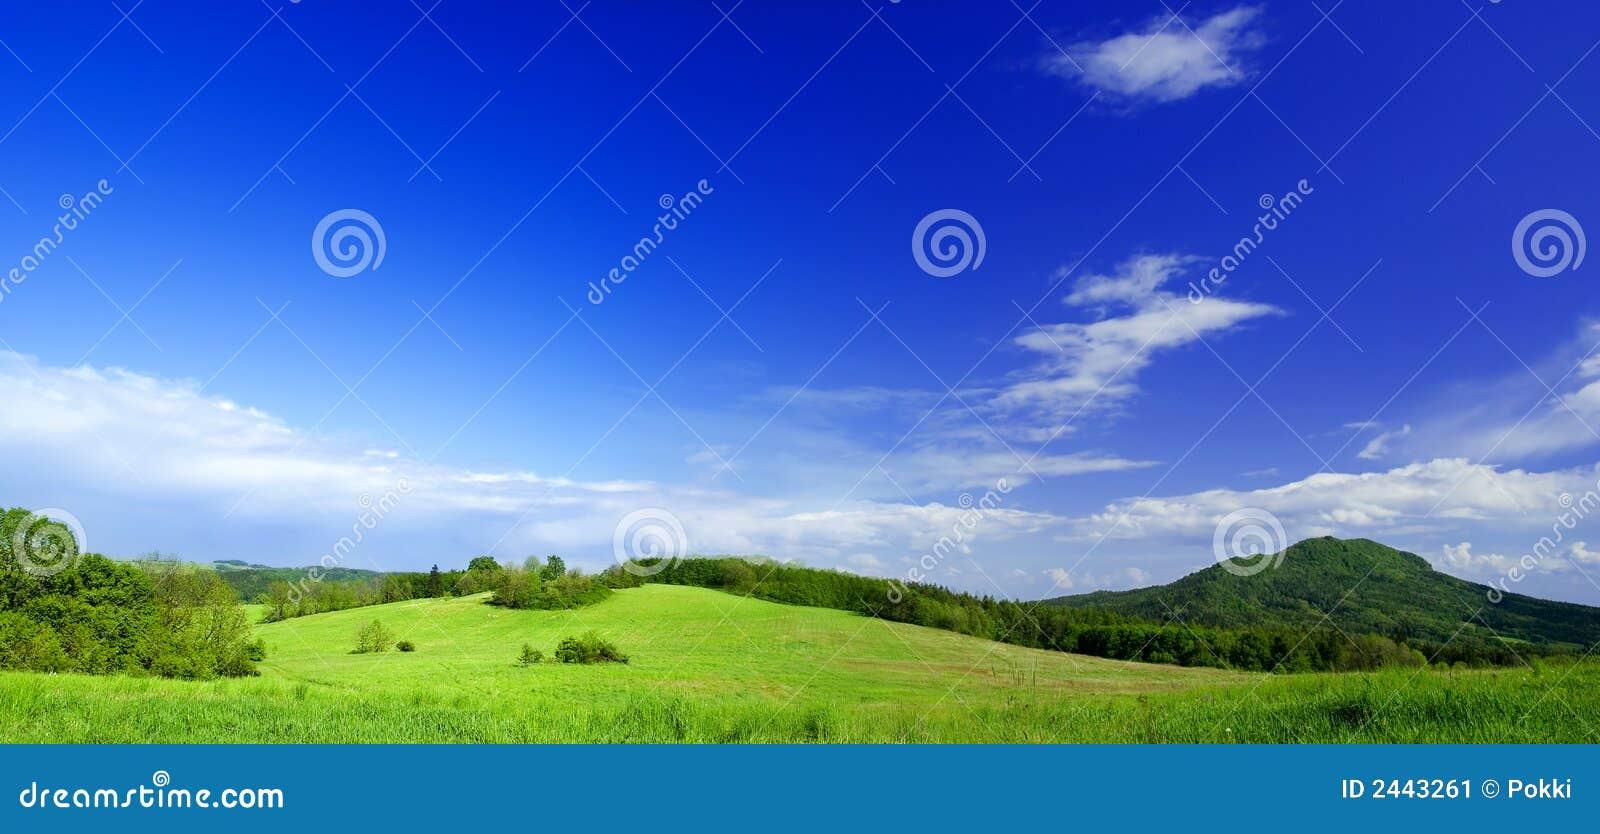 фото панорамы лужка